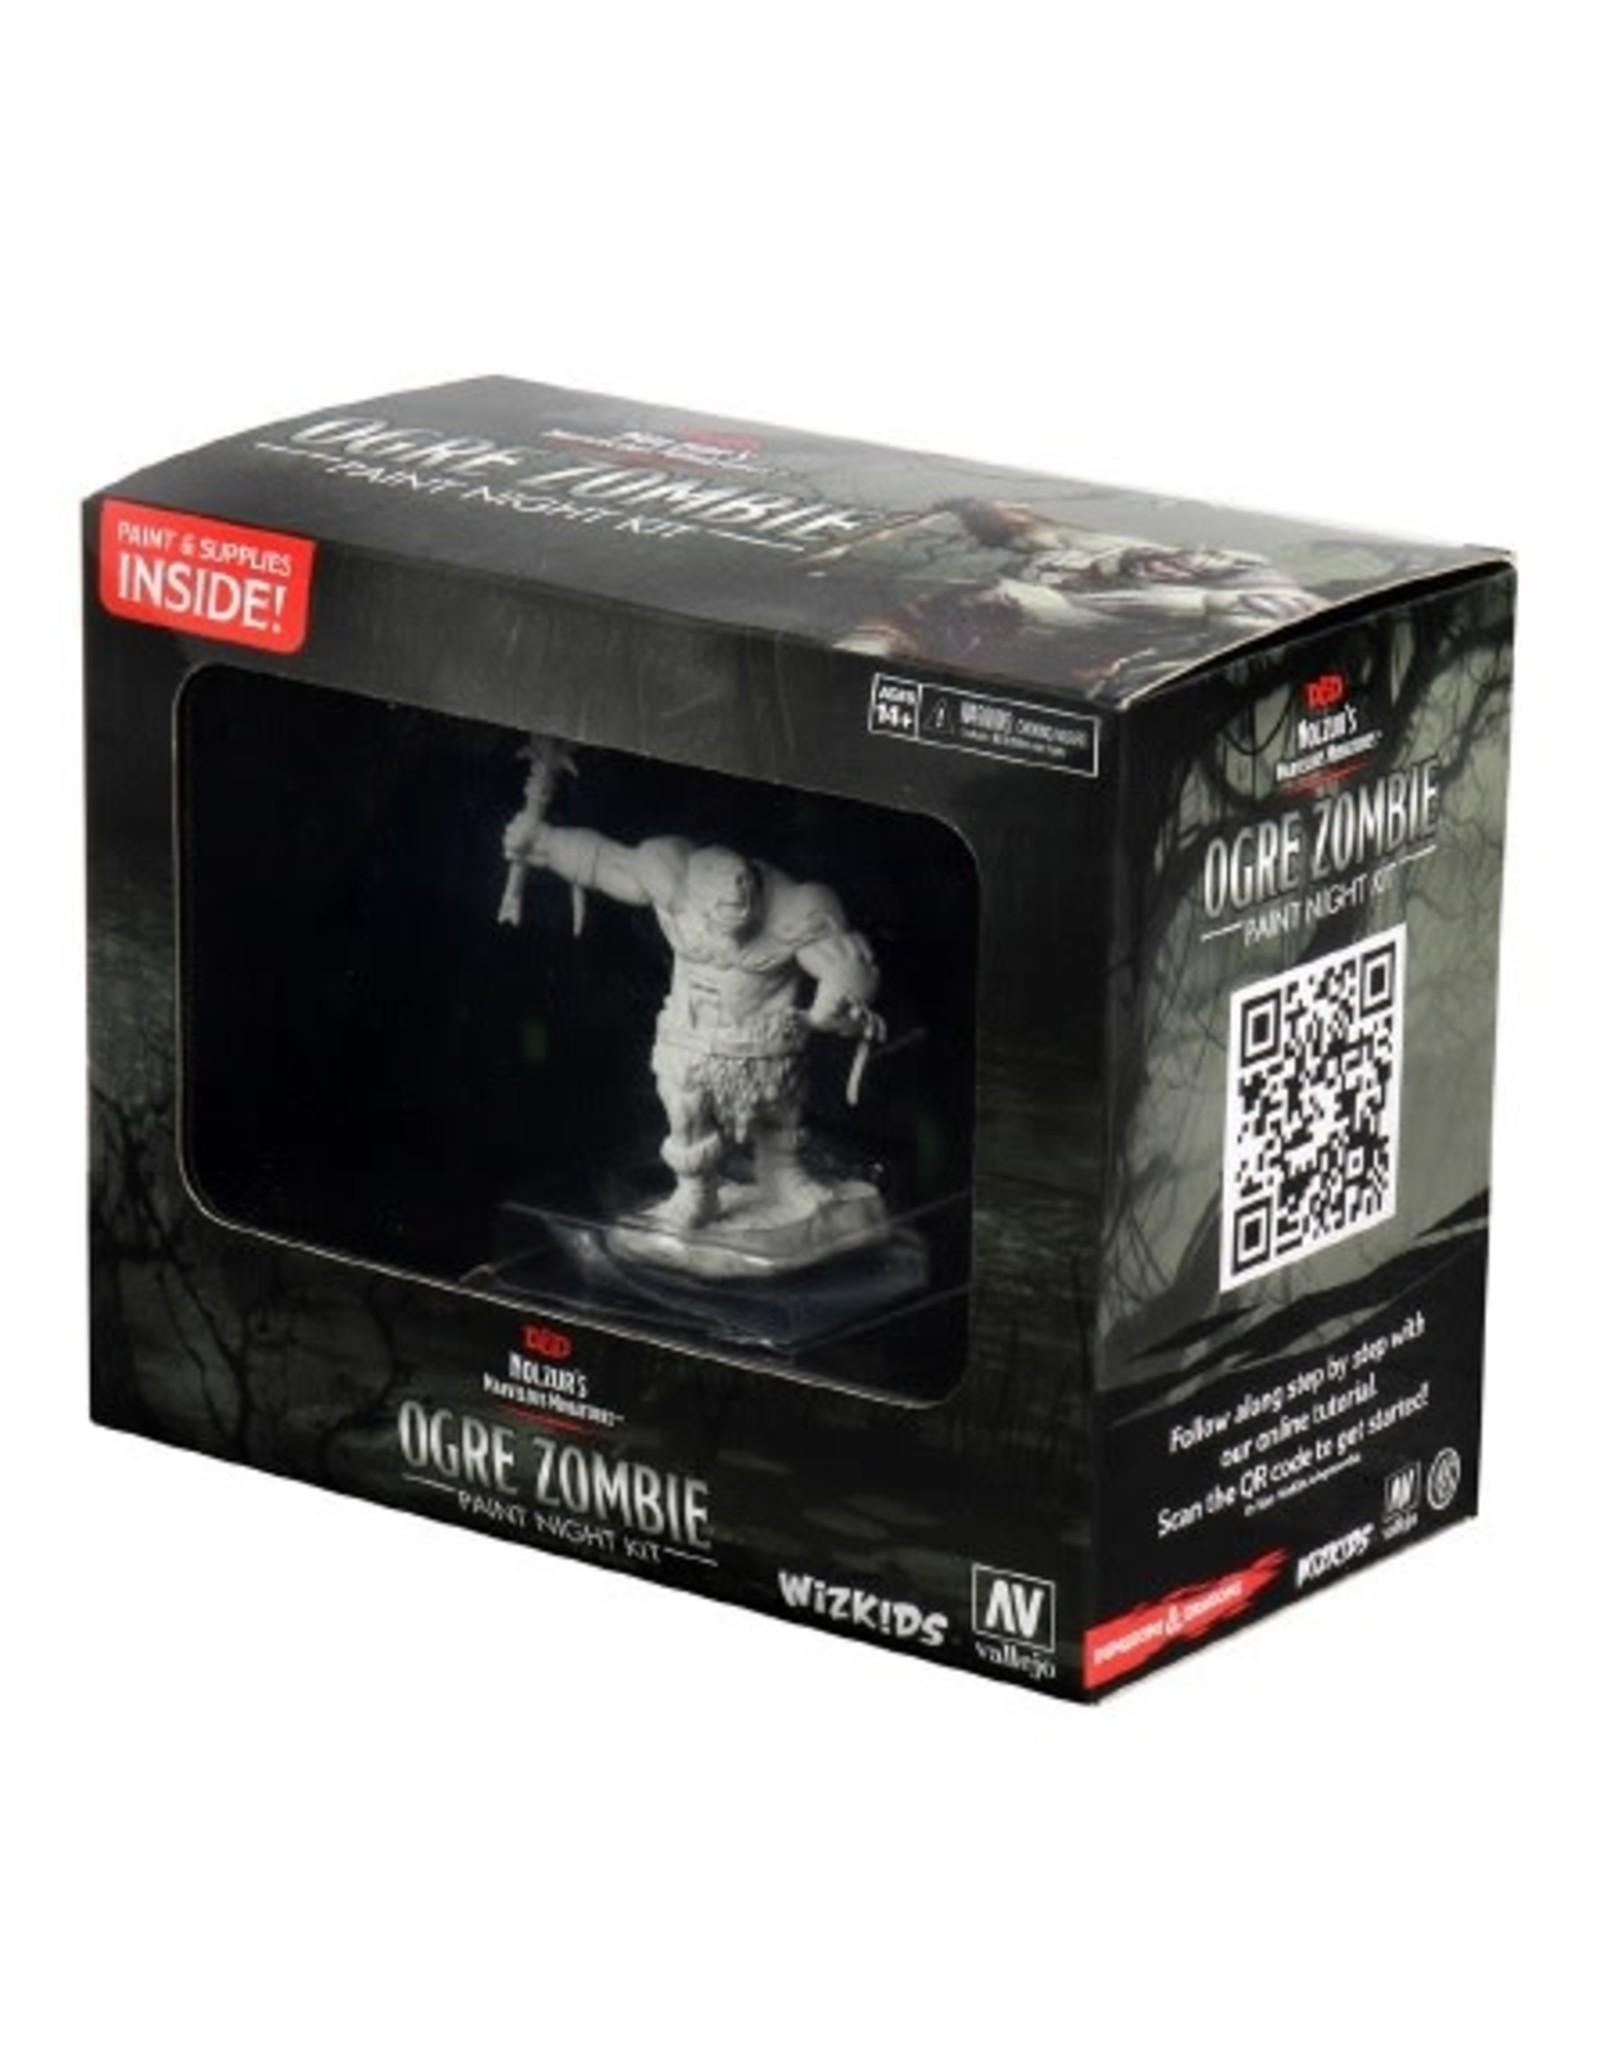 WizKids Dungeons & Dragons Nolzur's Marvelous Miniatures: Ogre Zombie Paint Night Kit